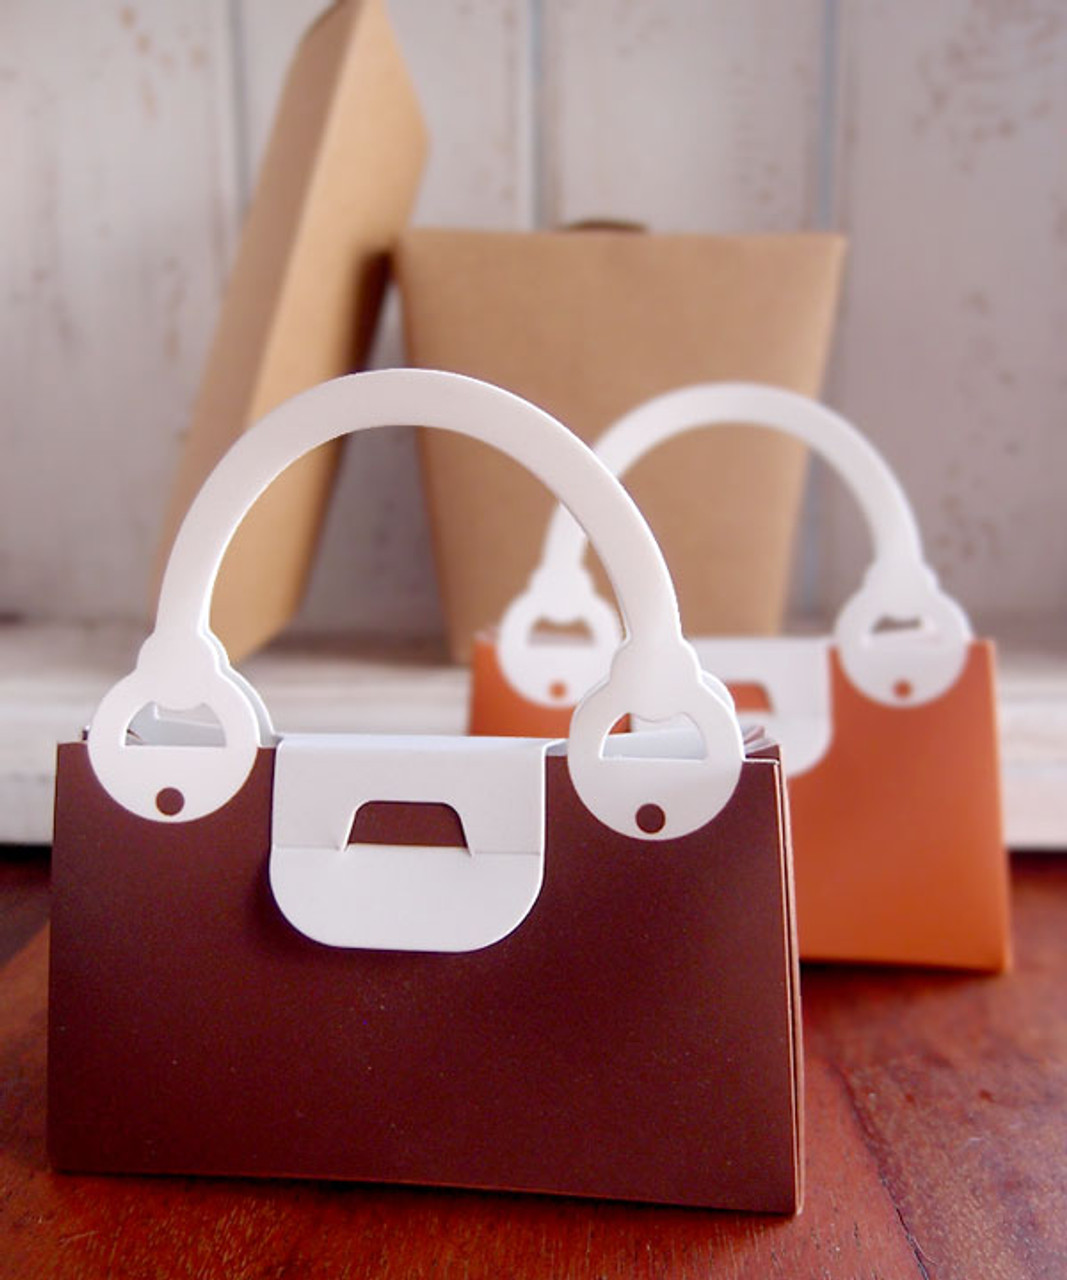 Chocolate Handbag Favor Box